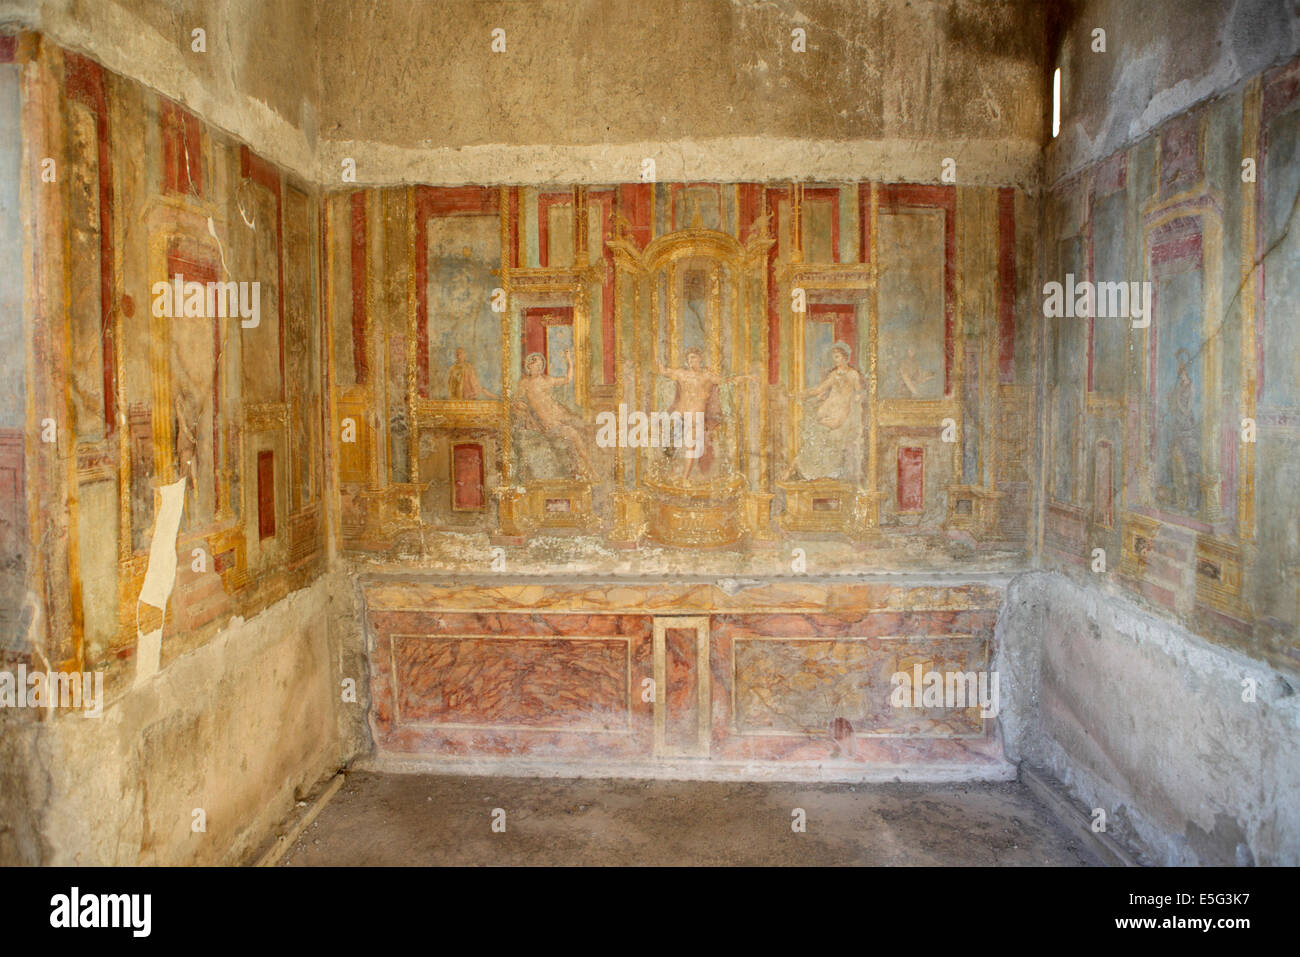 Original ancient frescoes in the House of Apollo, Pompeii, Naples, Italy - Stock Image